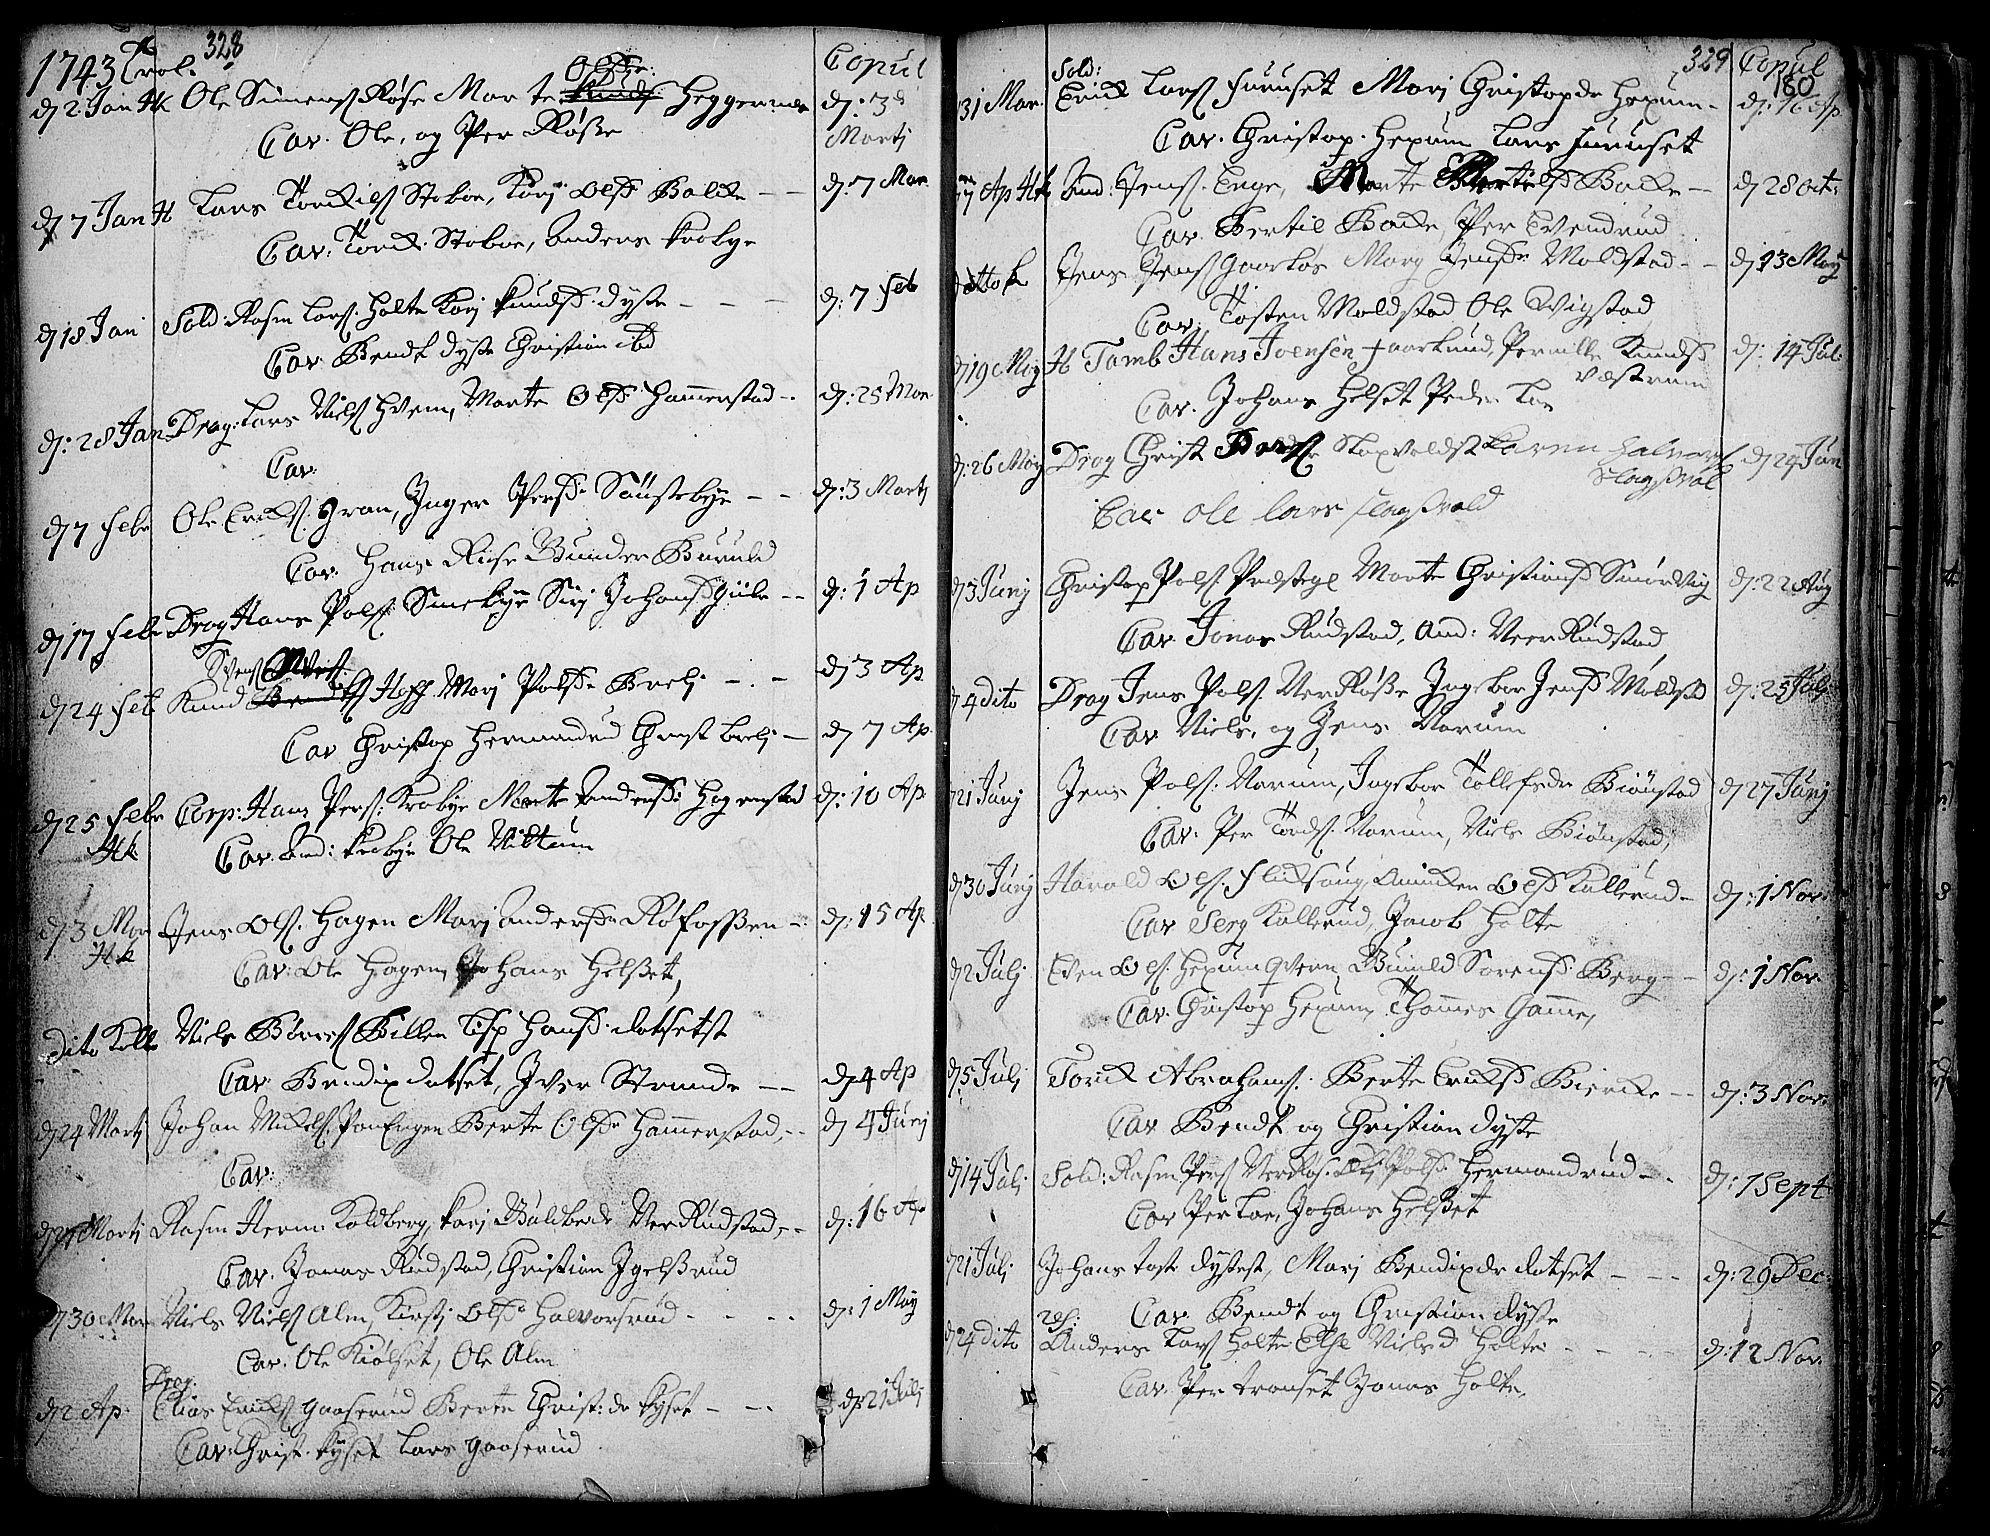 SAH, Toten prestekontor, Ministerialbok nr. 3, 1734-1751, s. 328-329